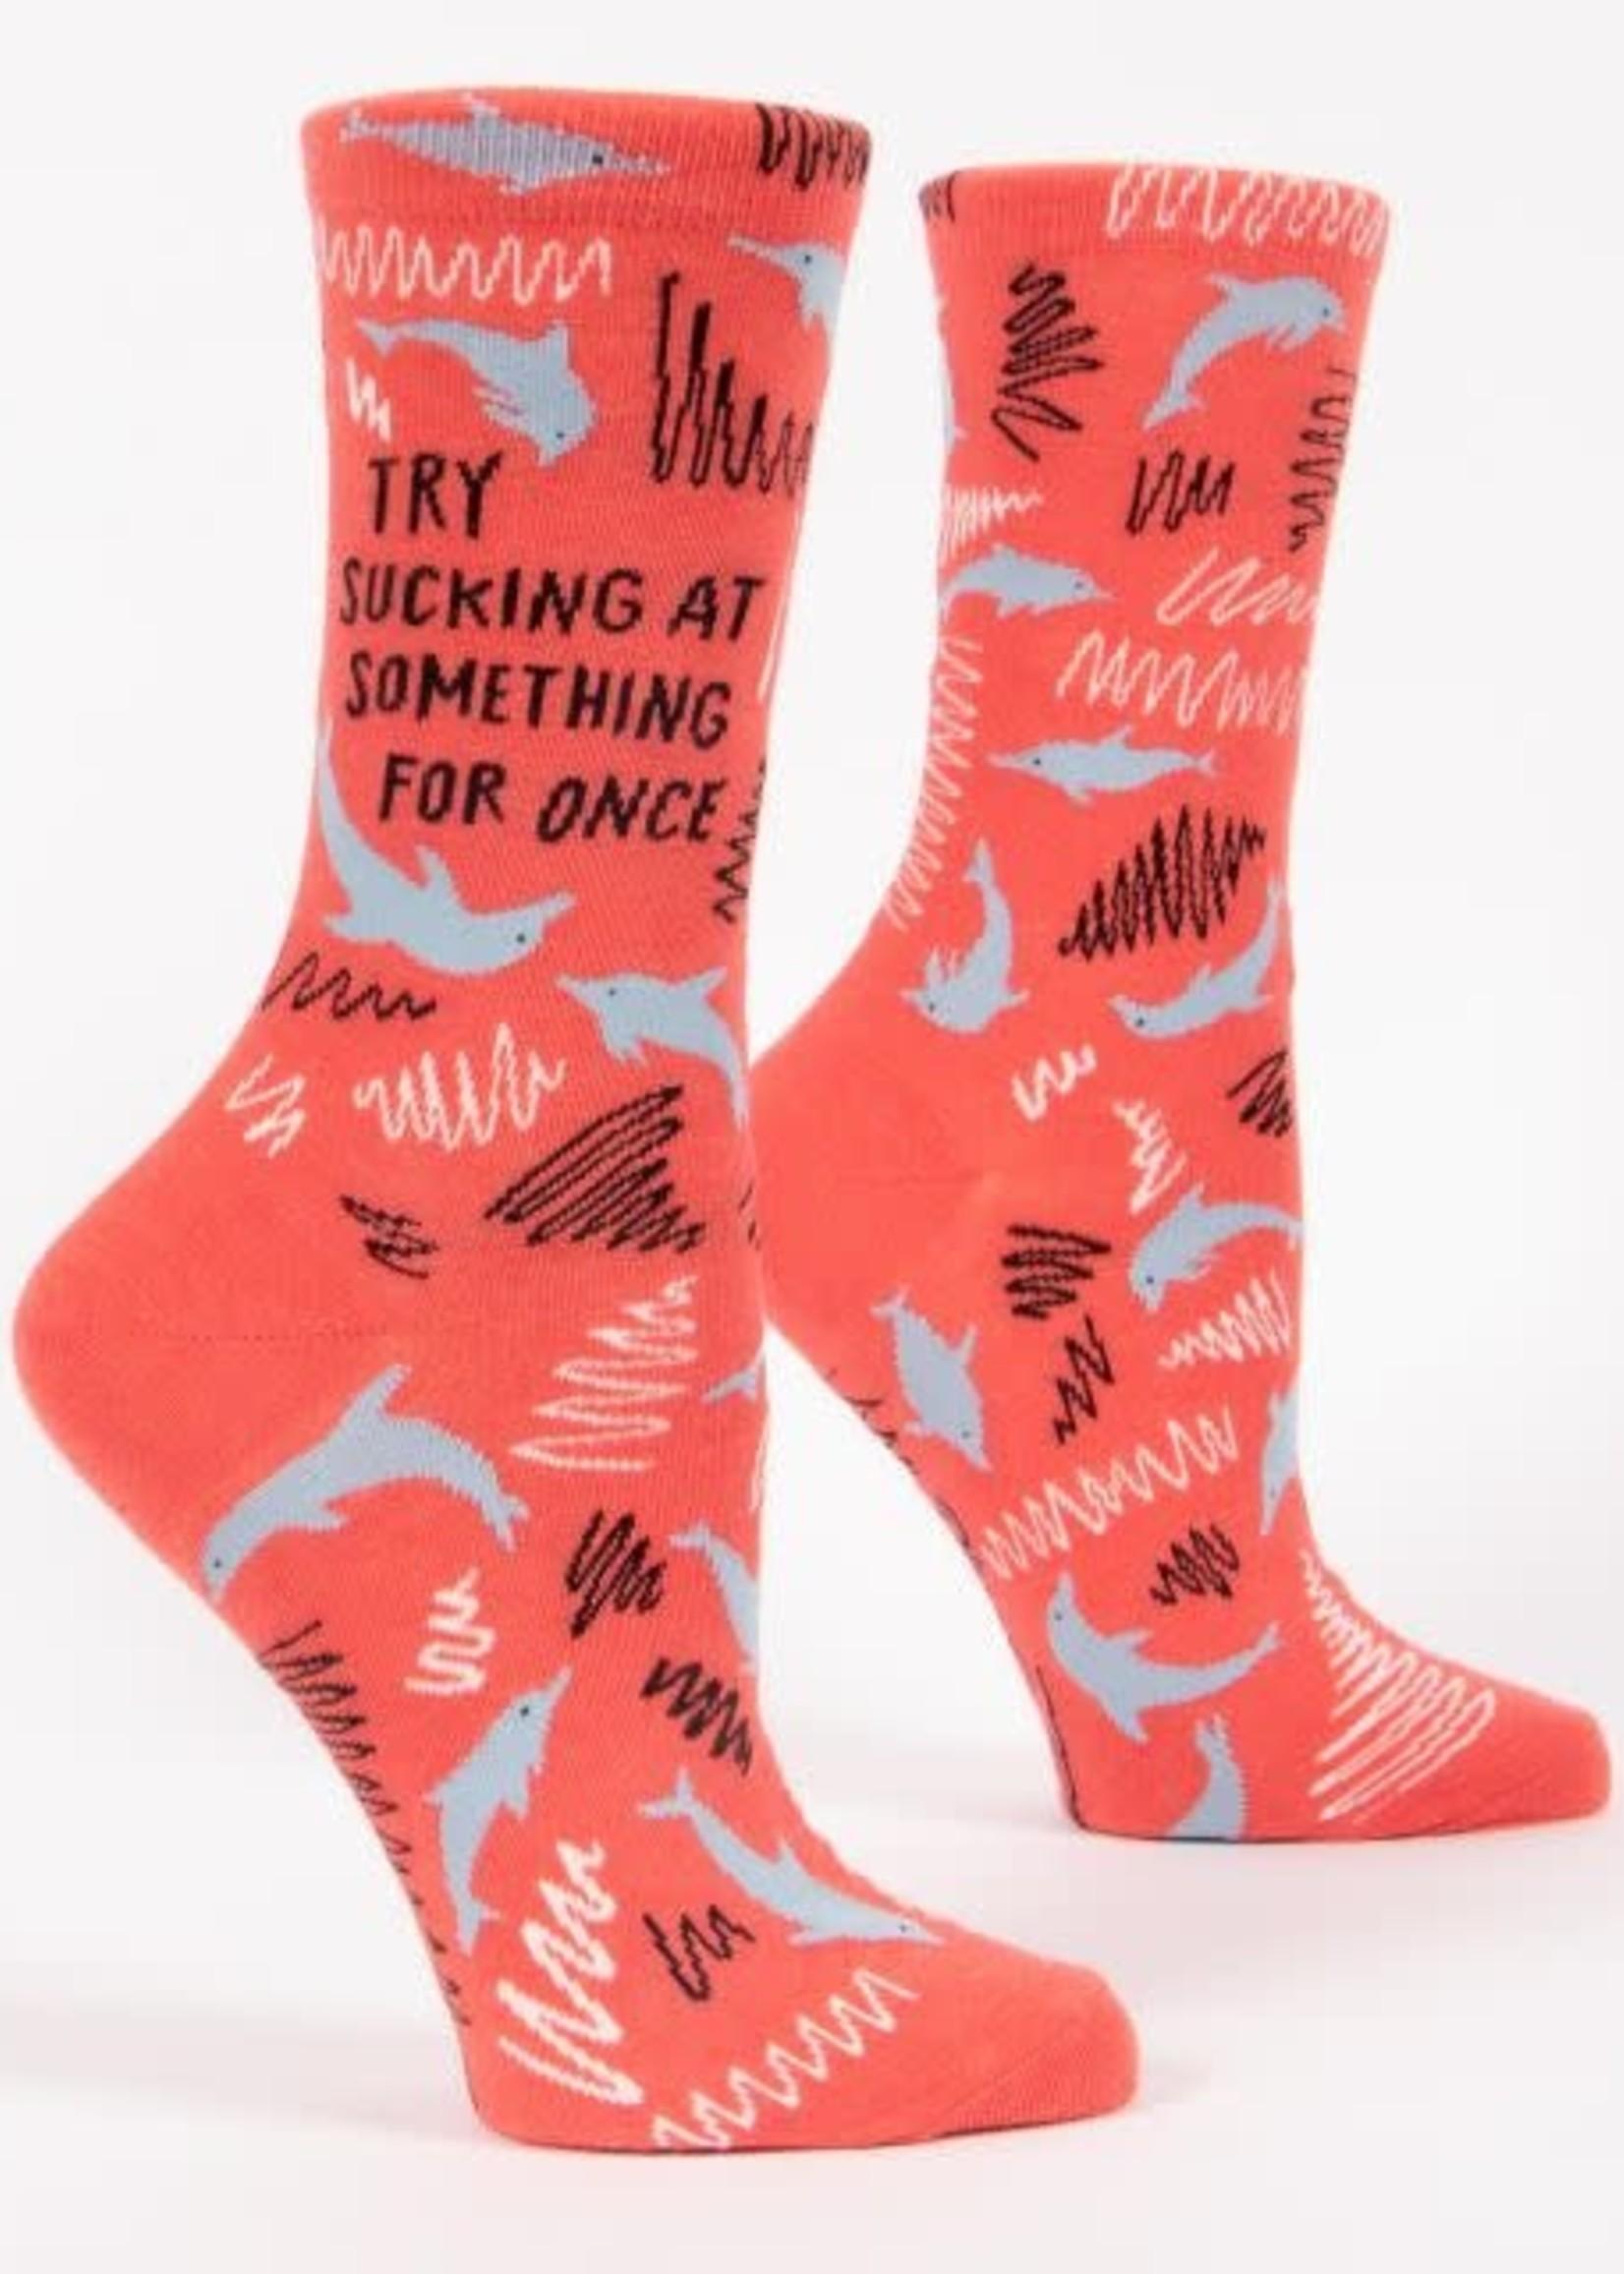 Blue Q Blue Q Women's Socks Sucking At Something